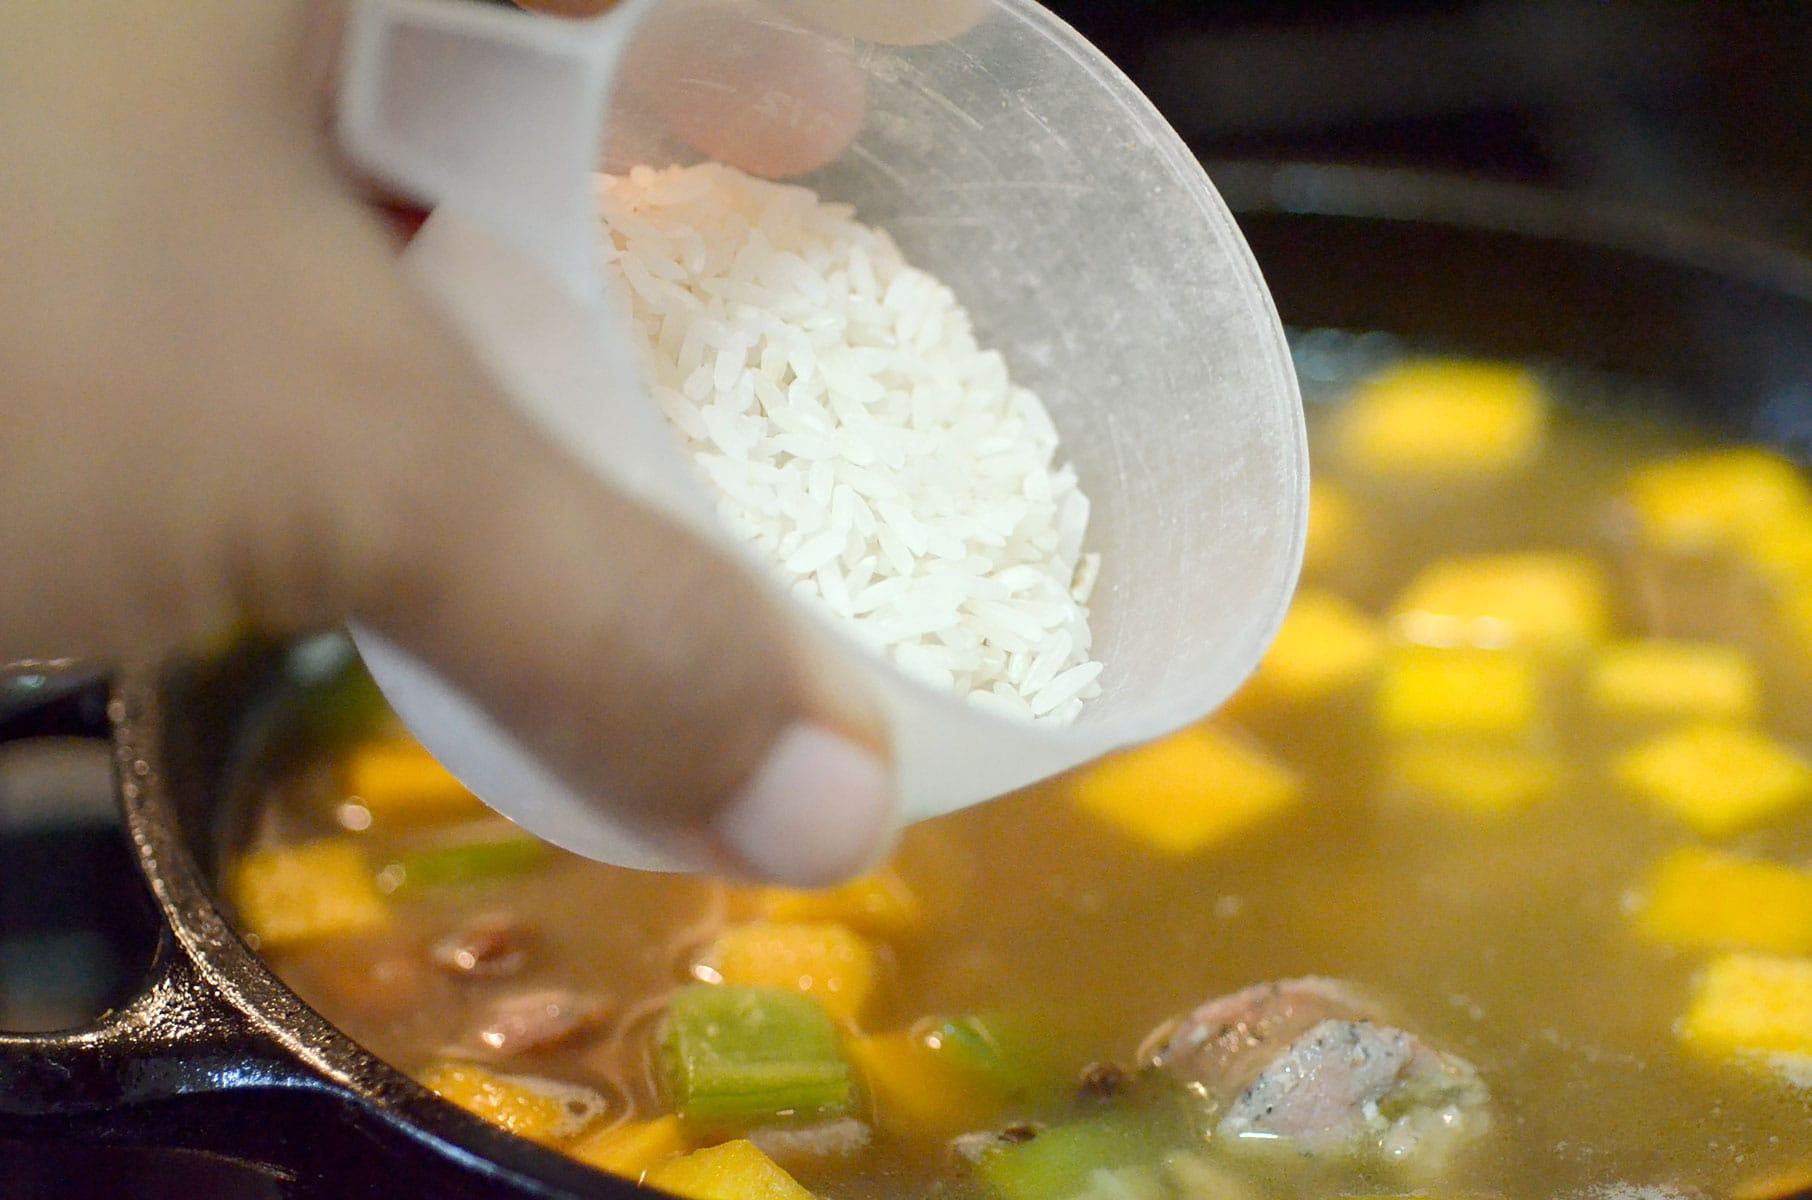 Adding raw rice to pot